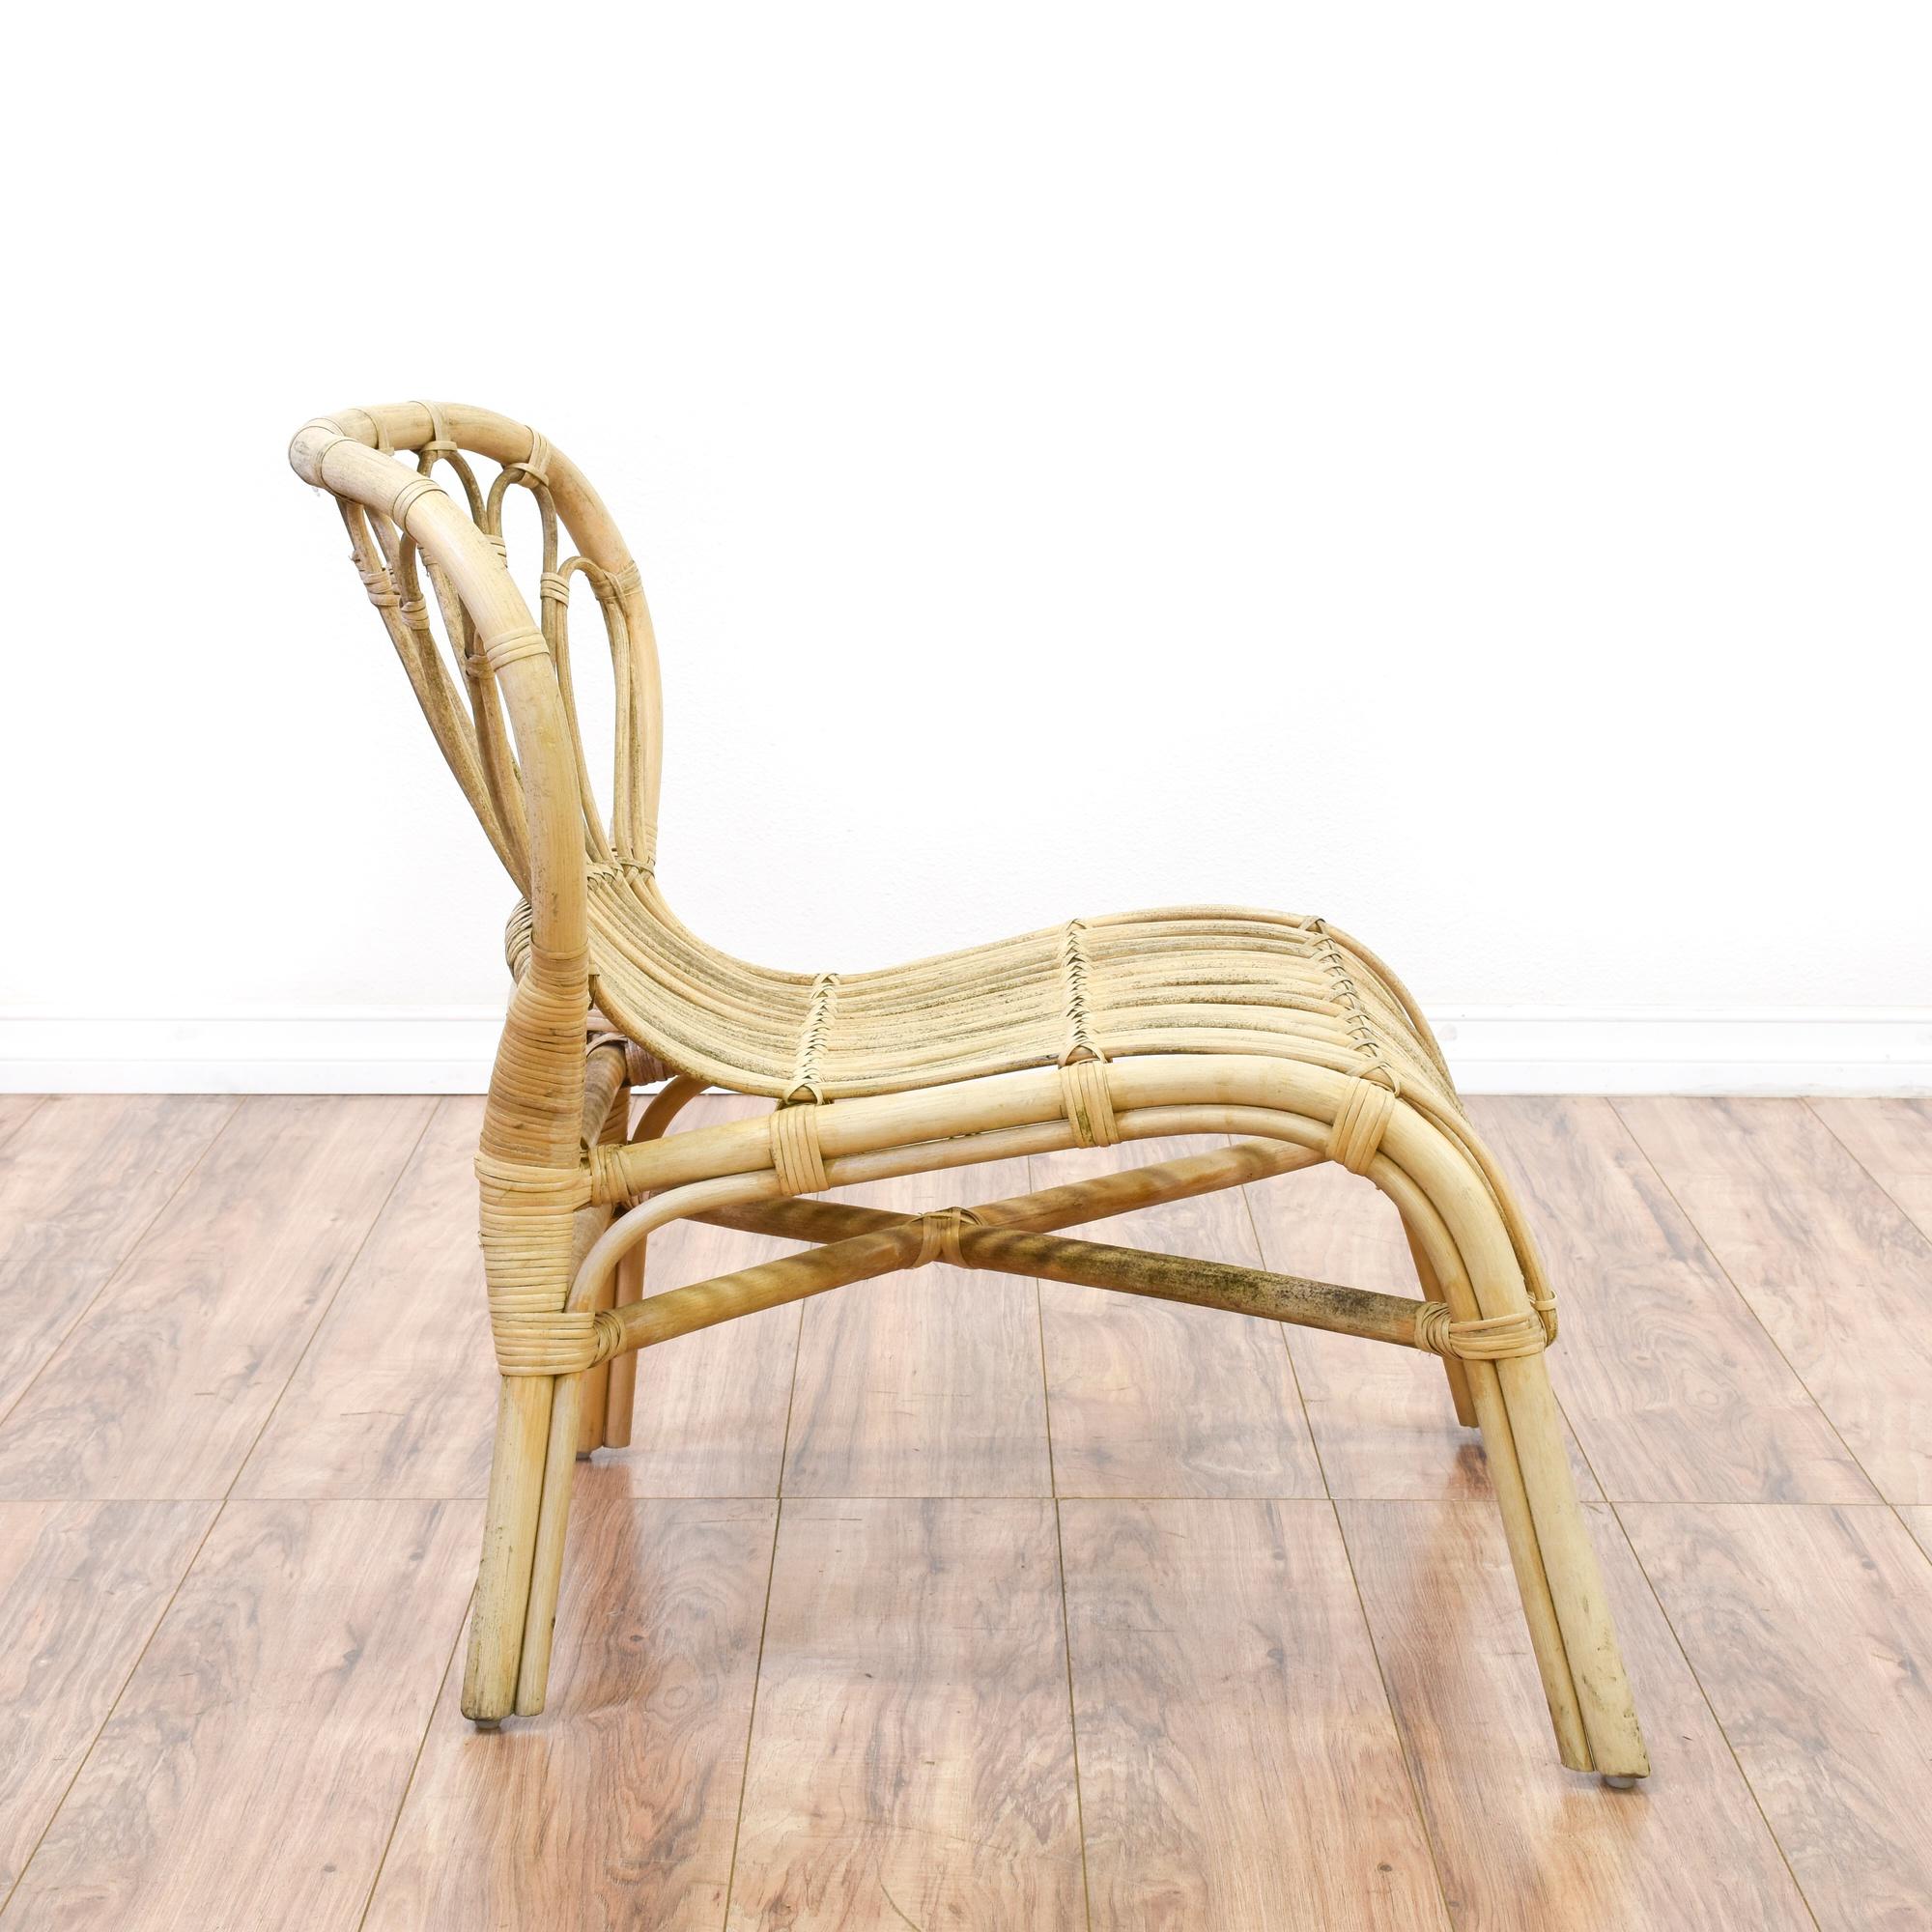 Bohemian Light Rattan Accent Chair Loveseat Vintage